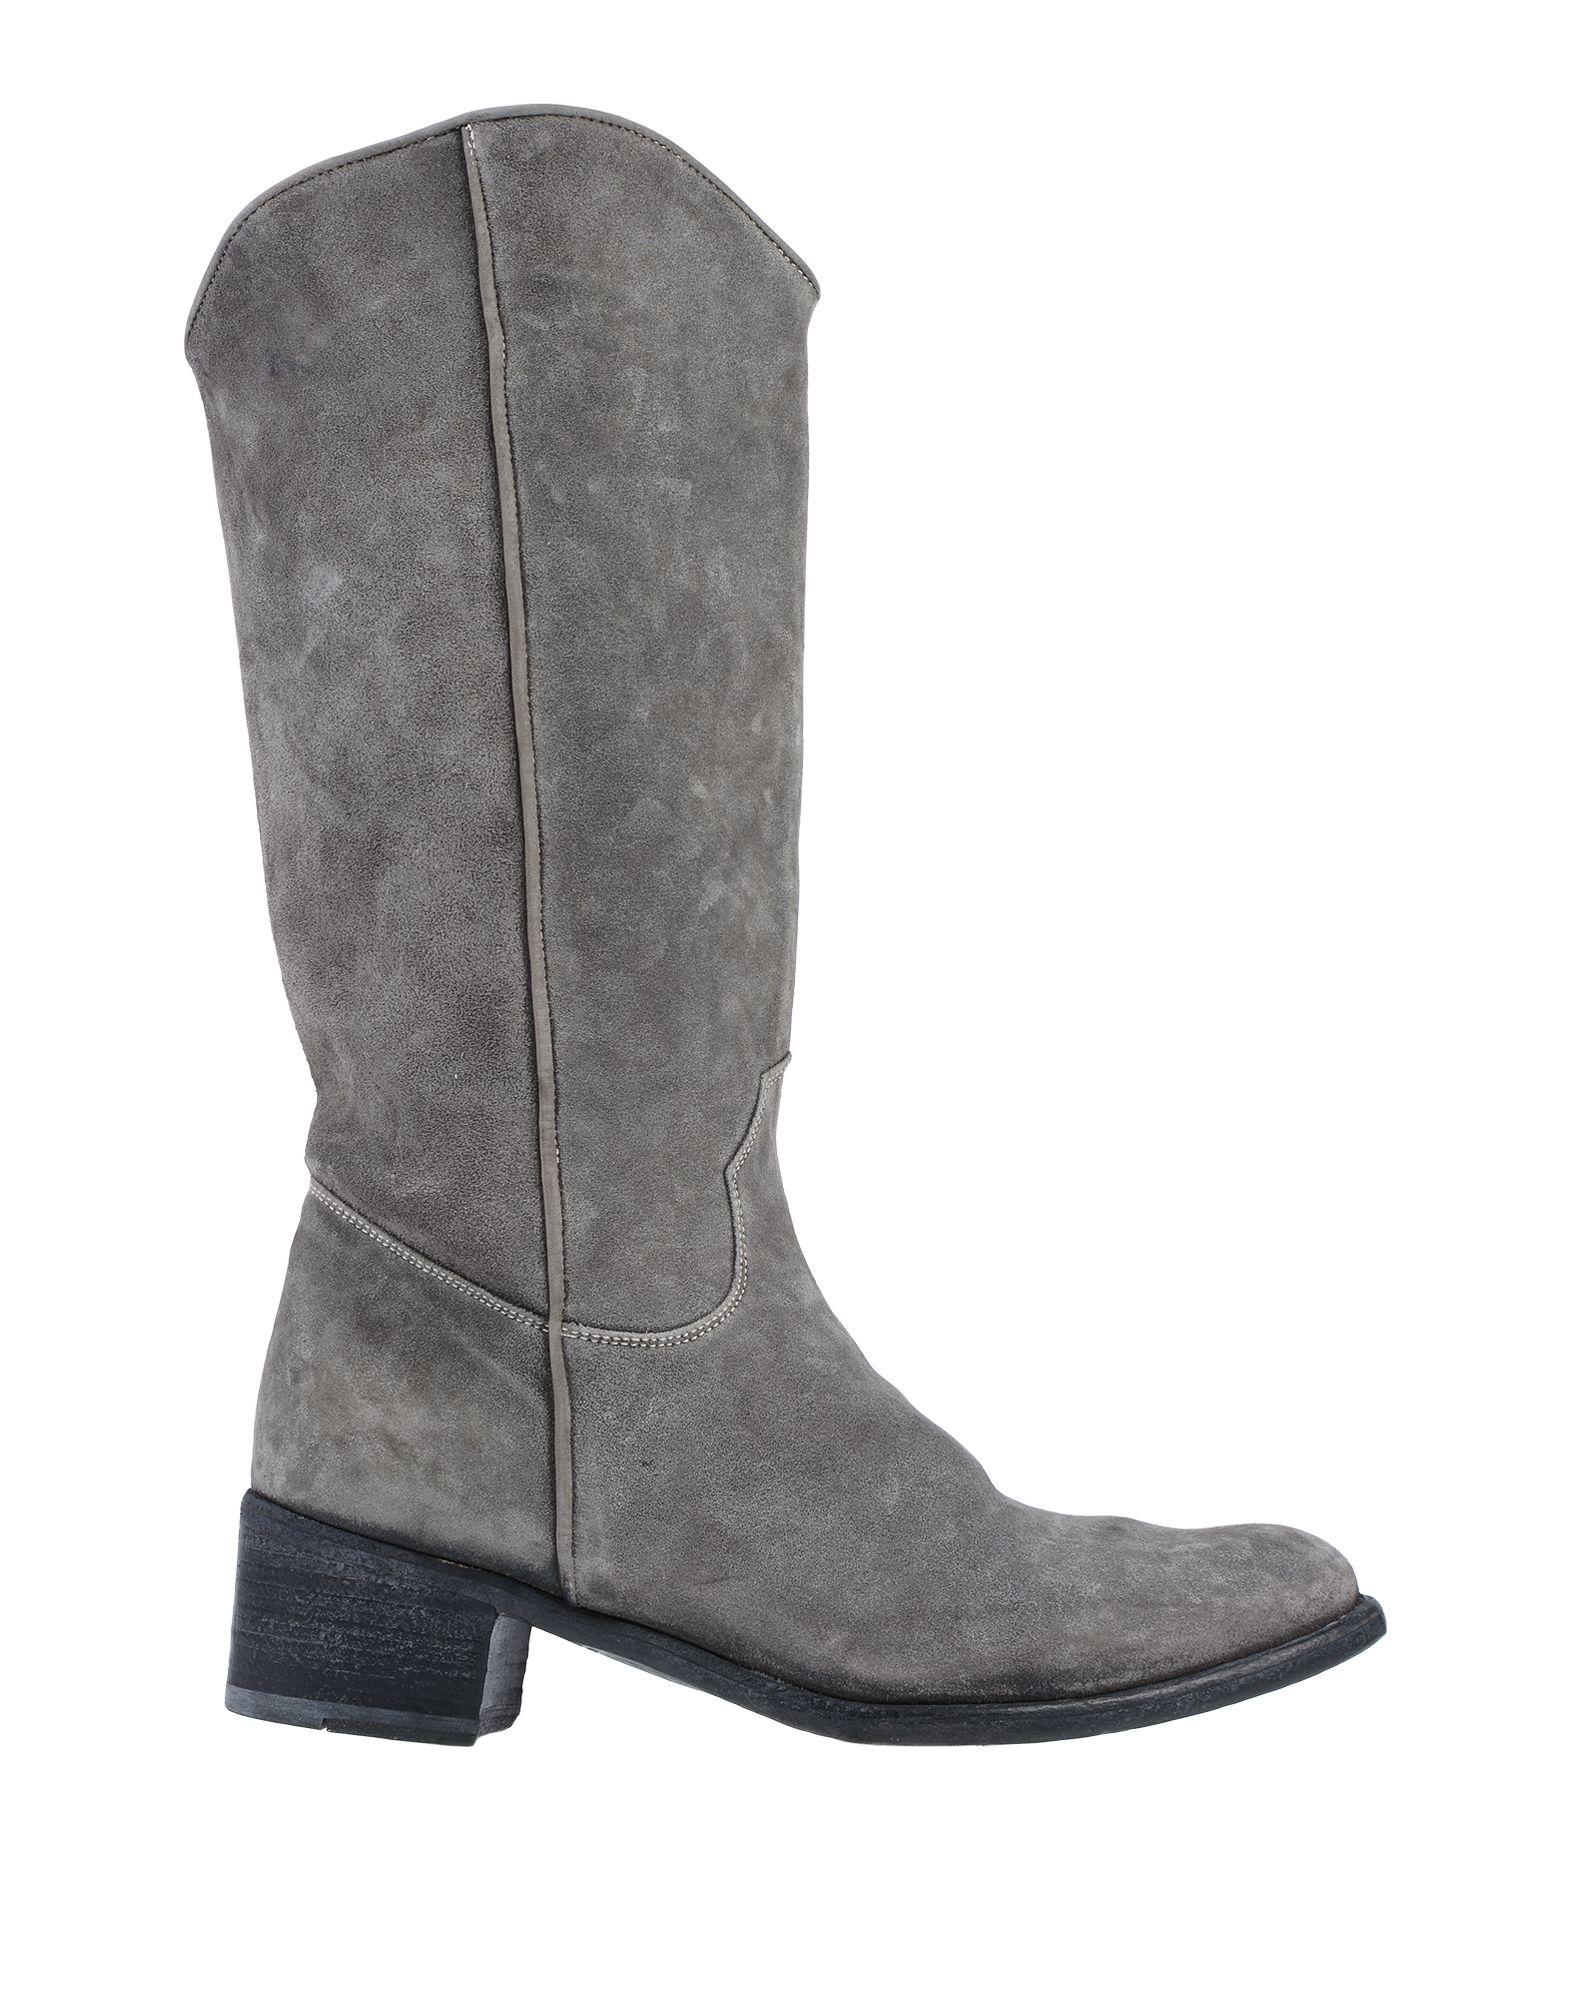 Officine Creative Italia Boots - Women online Officine Creative Italia Boots online Women on  United Kingdom - 11547580OT 7de783